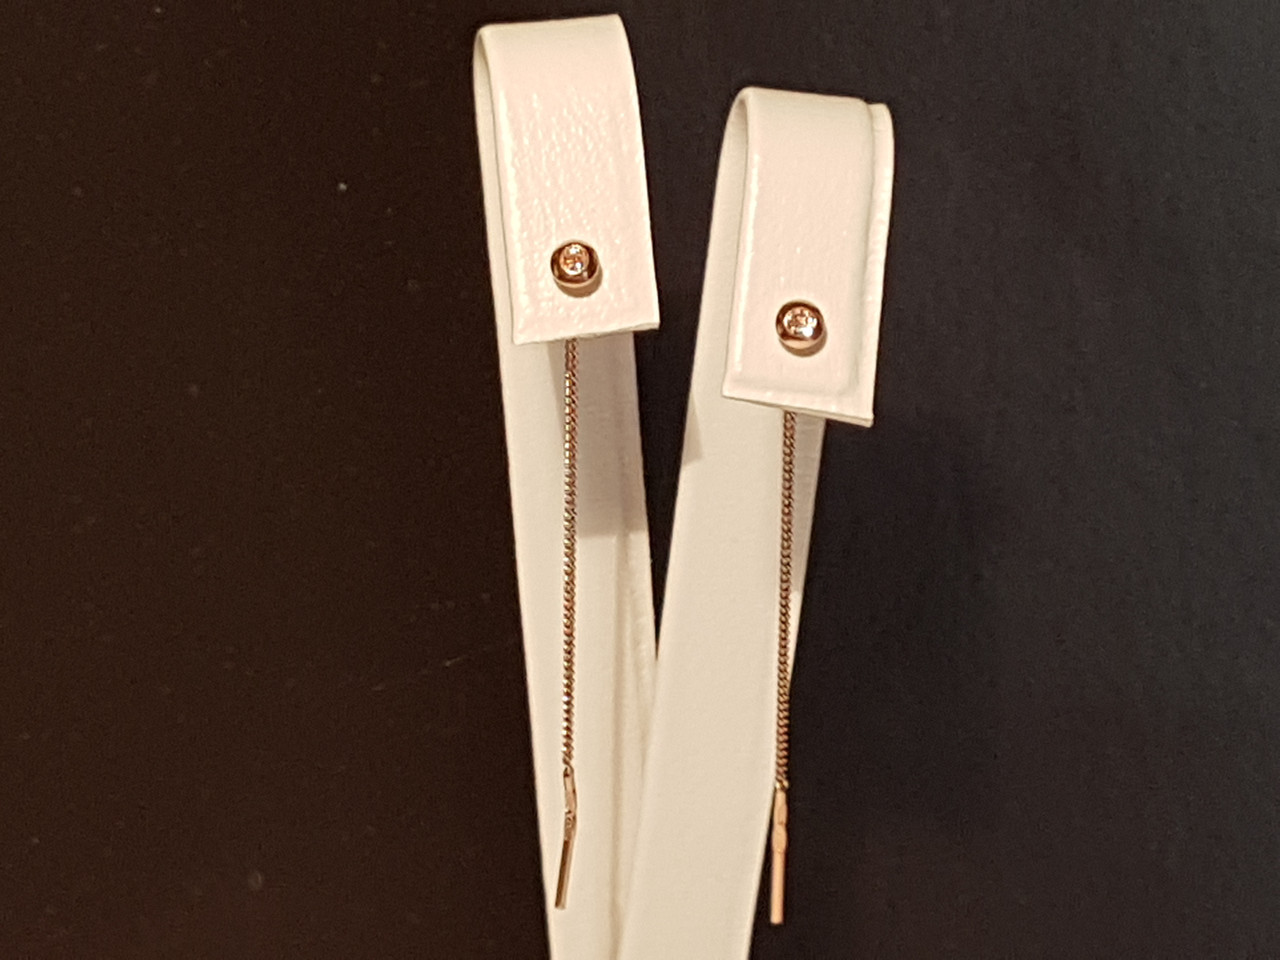 Золотые серьги-протяжки. Артикул 104980